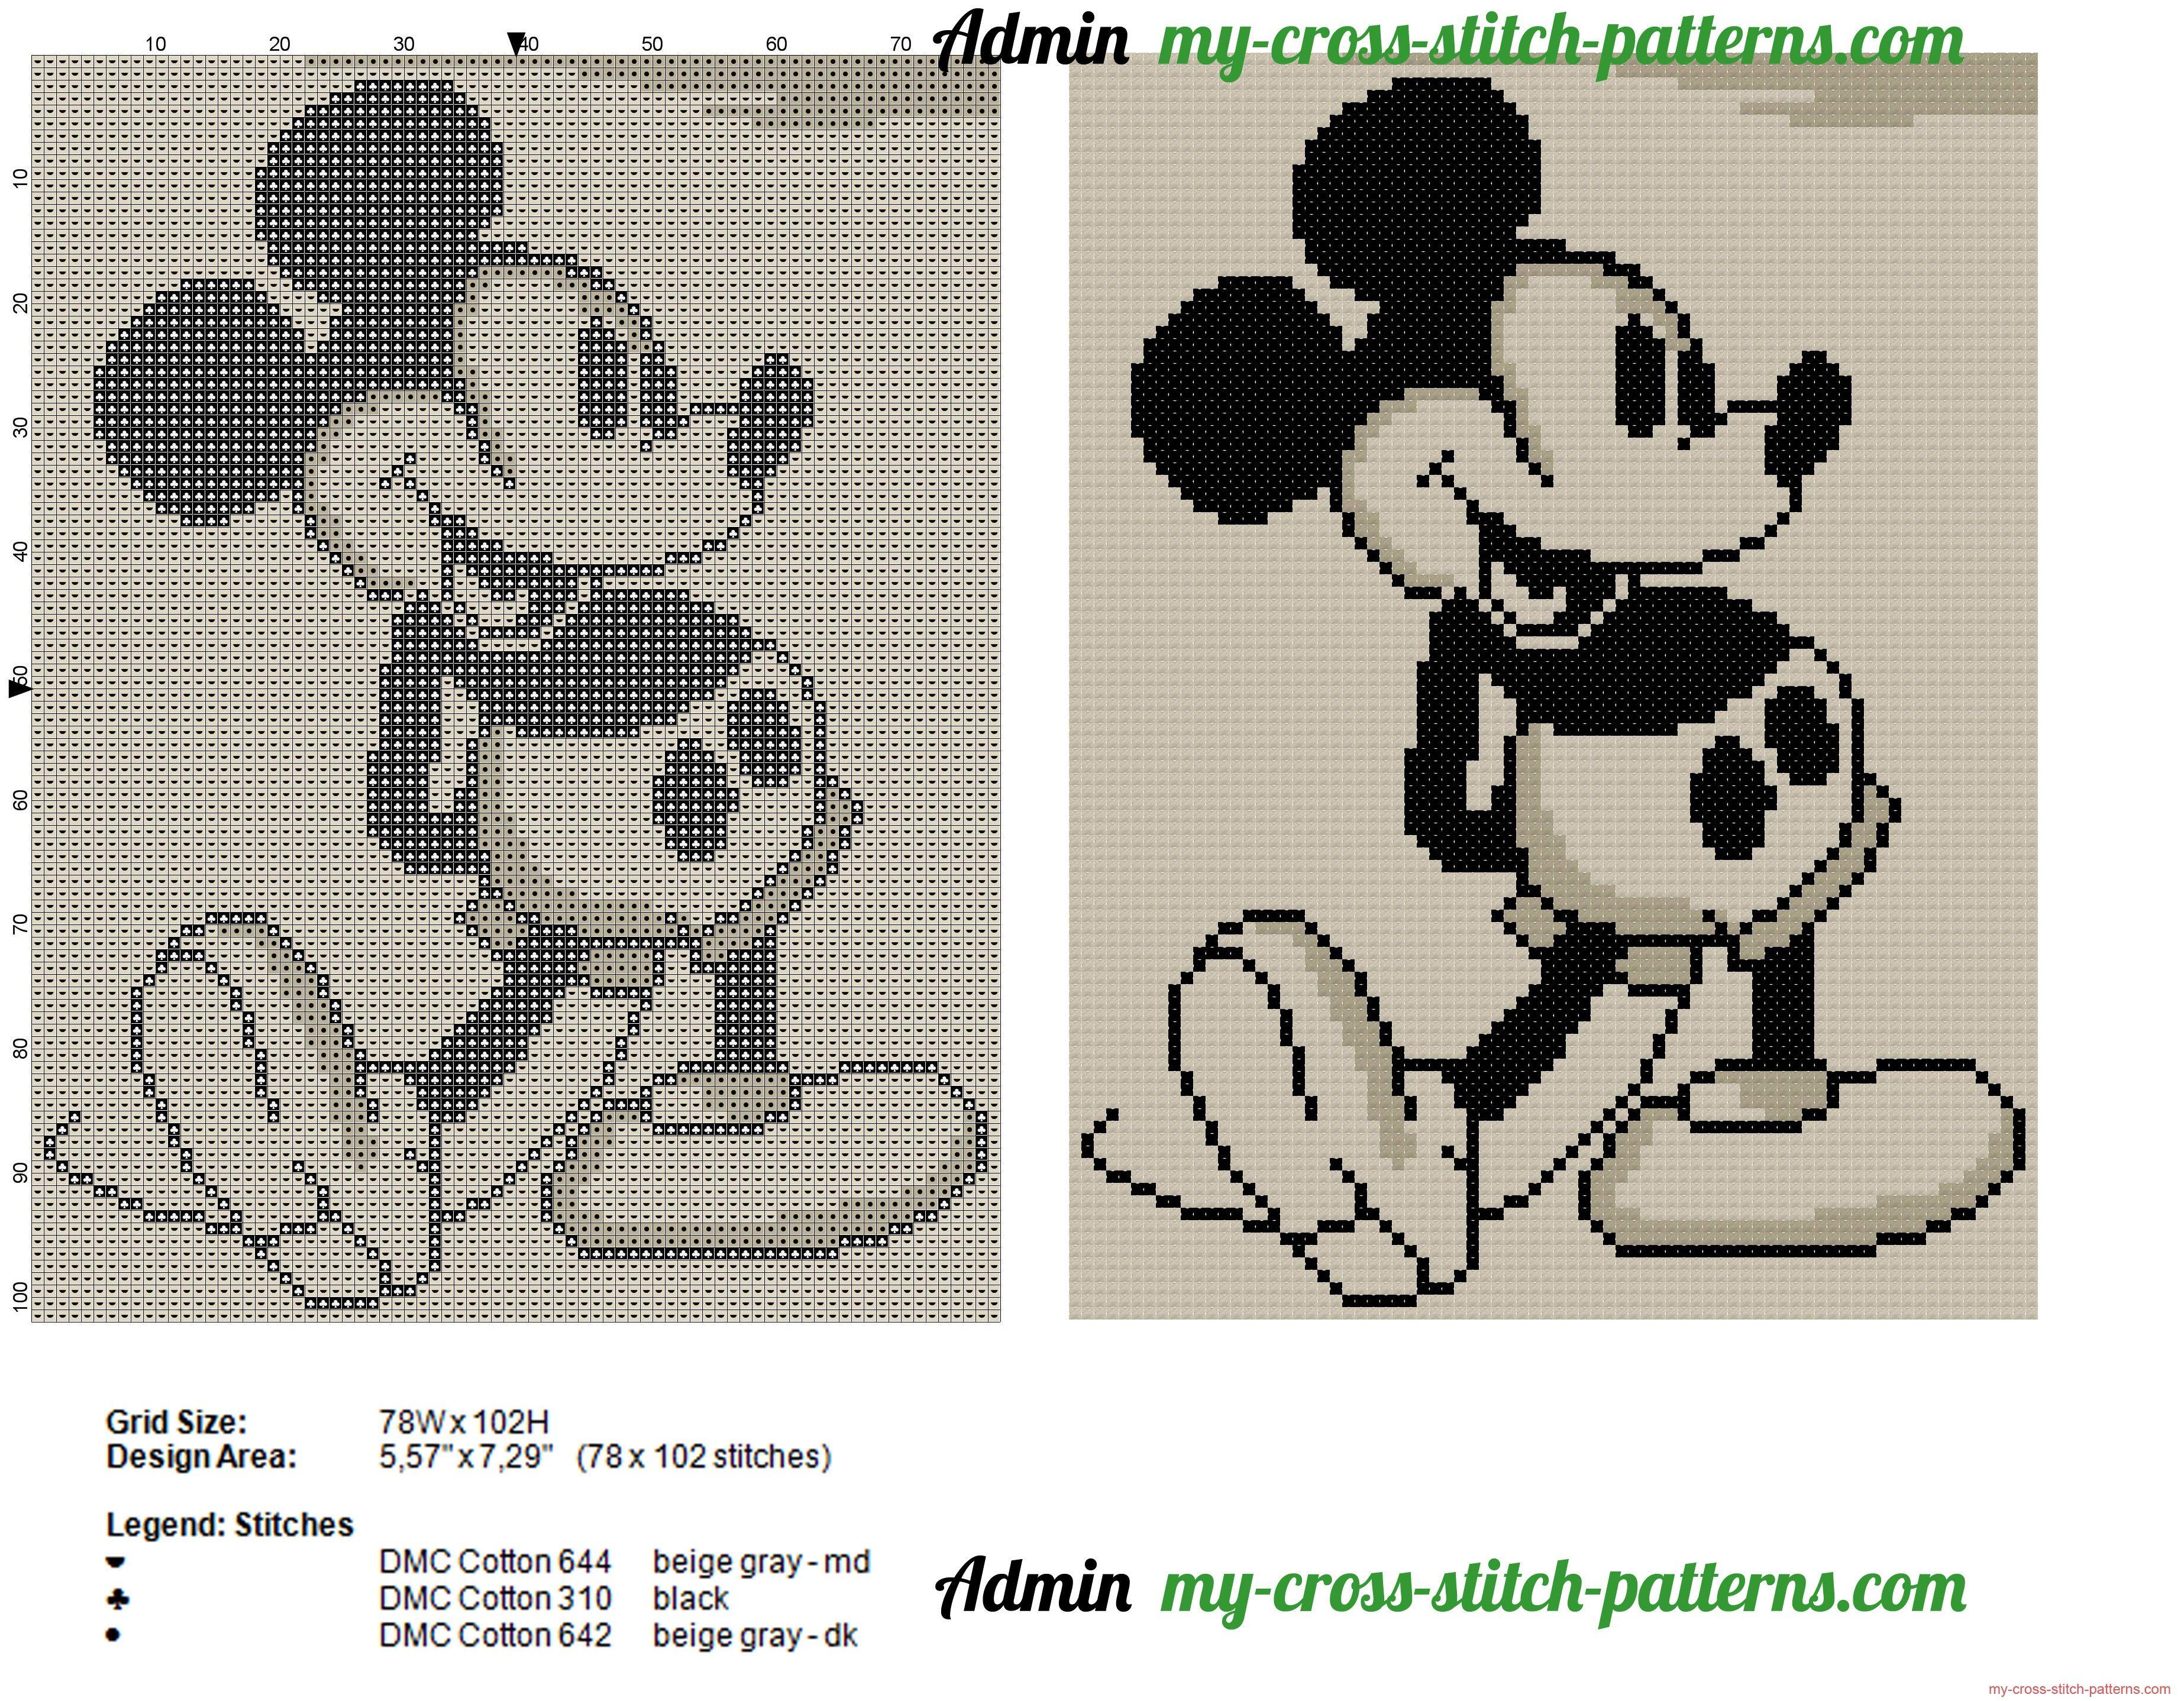 mickey_mouse_estilo_de_epoca_esquema_punto_de_cruz_78x102.jpg 3,692 ...